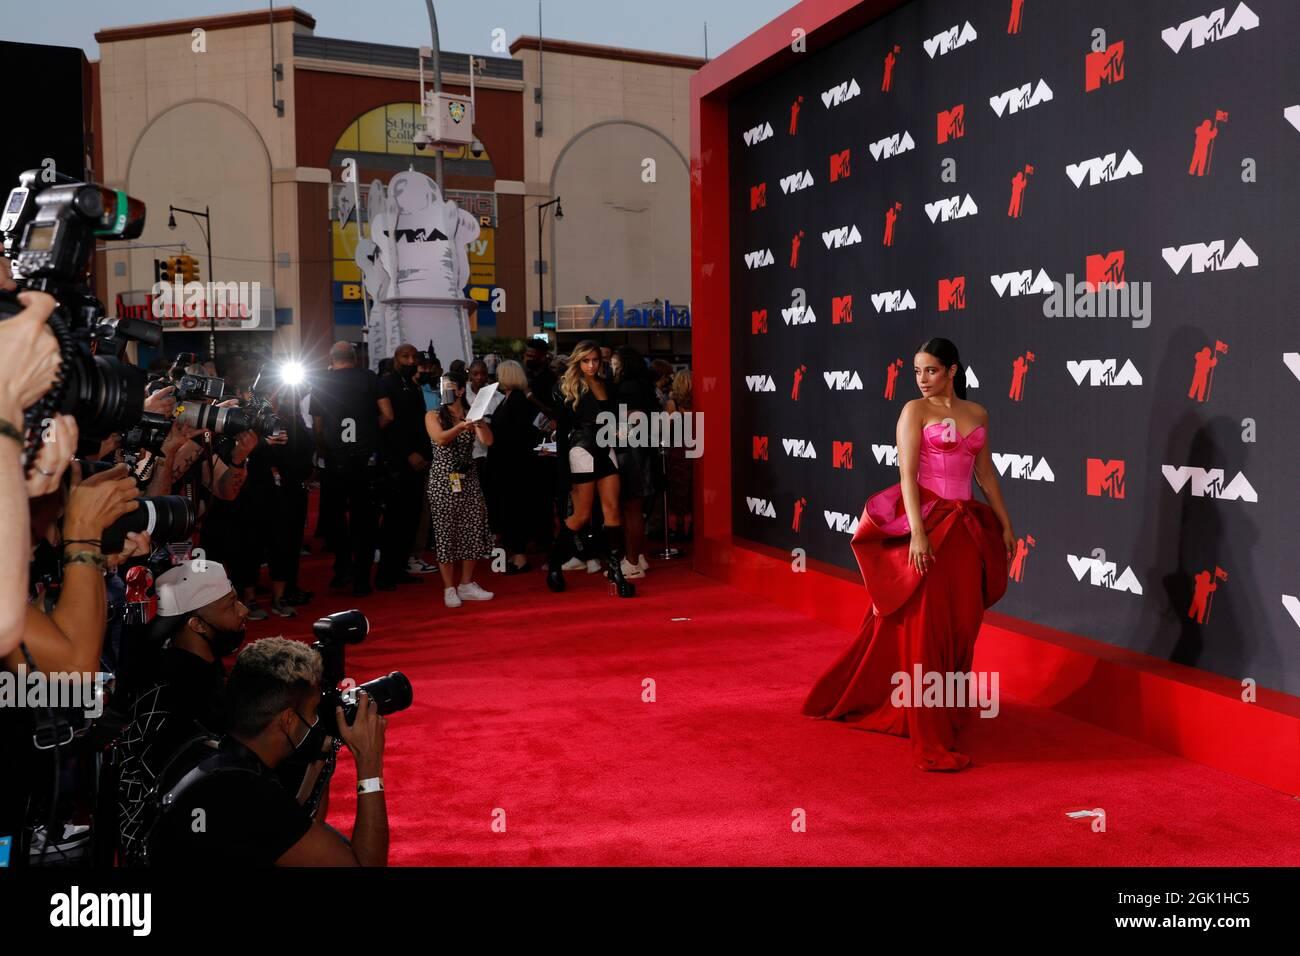 2021 MTV Video Music Awards - Ankunft - Barclays Center, Brooklyn, New York, USA, 12. September, 2021 - Camila Cabello. REUTERS/Andrew Kelly Stockfoto